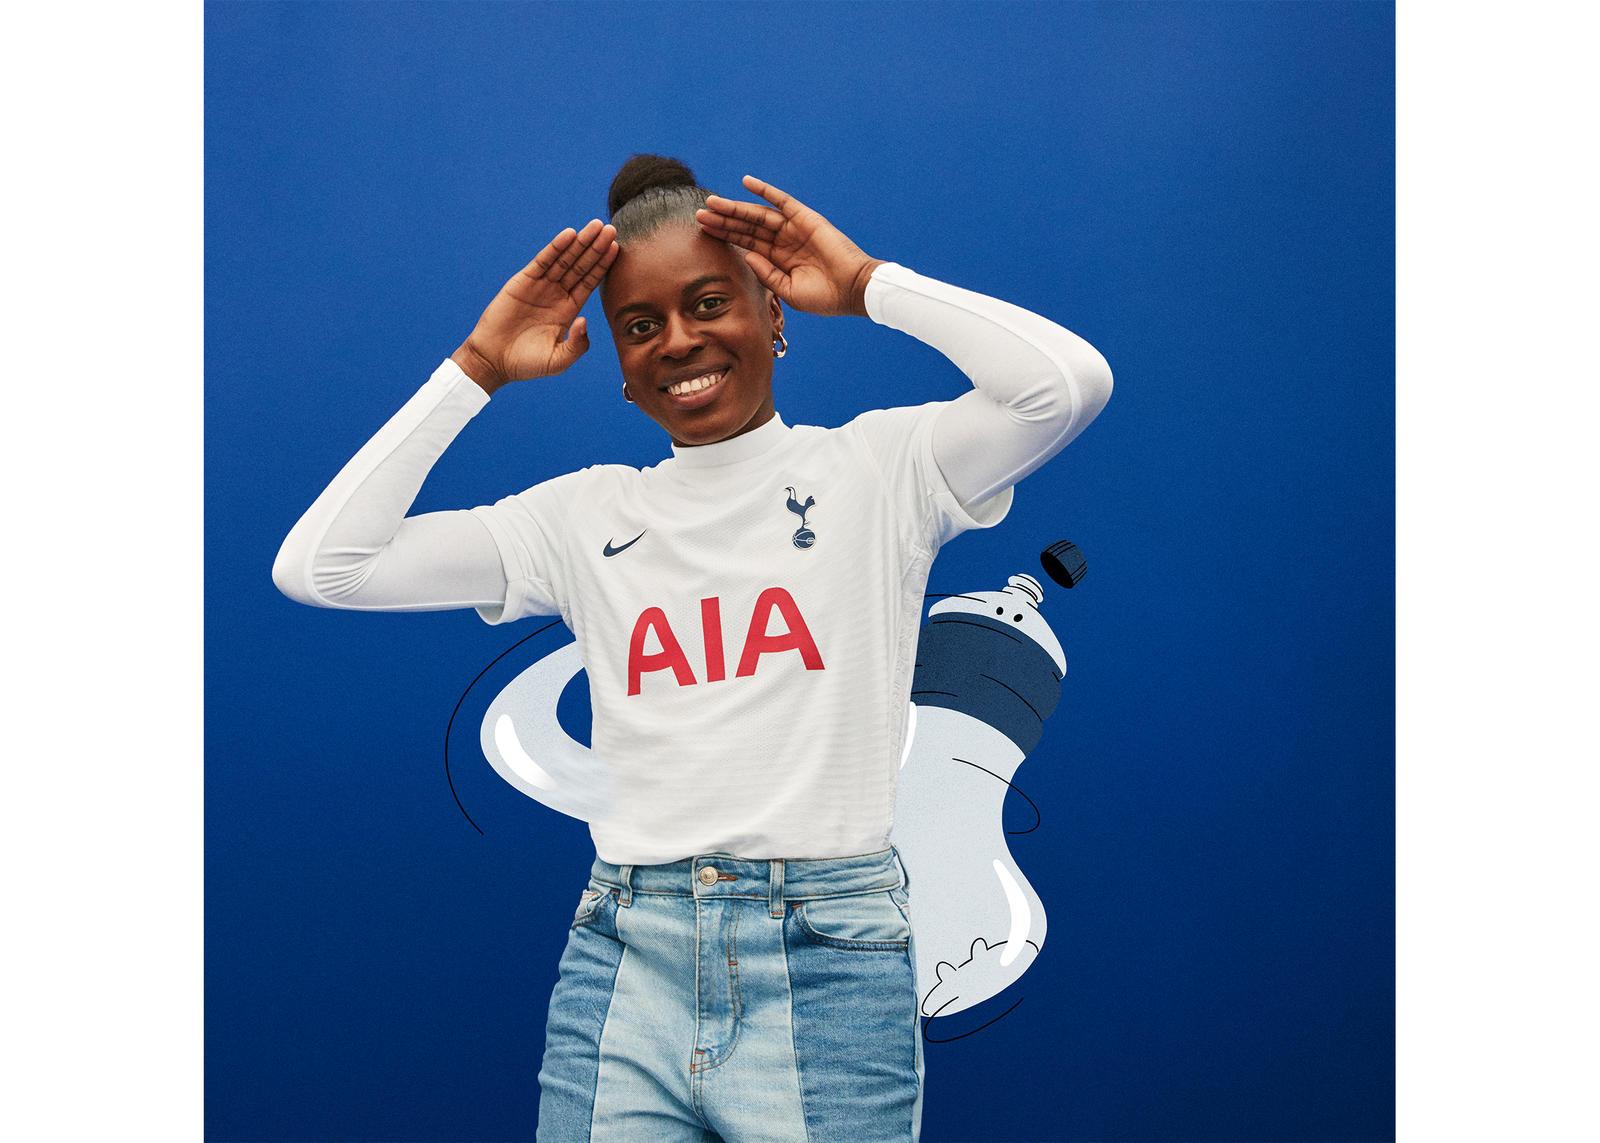 Tottenham Hotspur 2021-22 Home Kit Official Images 1